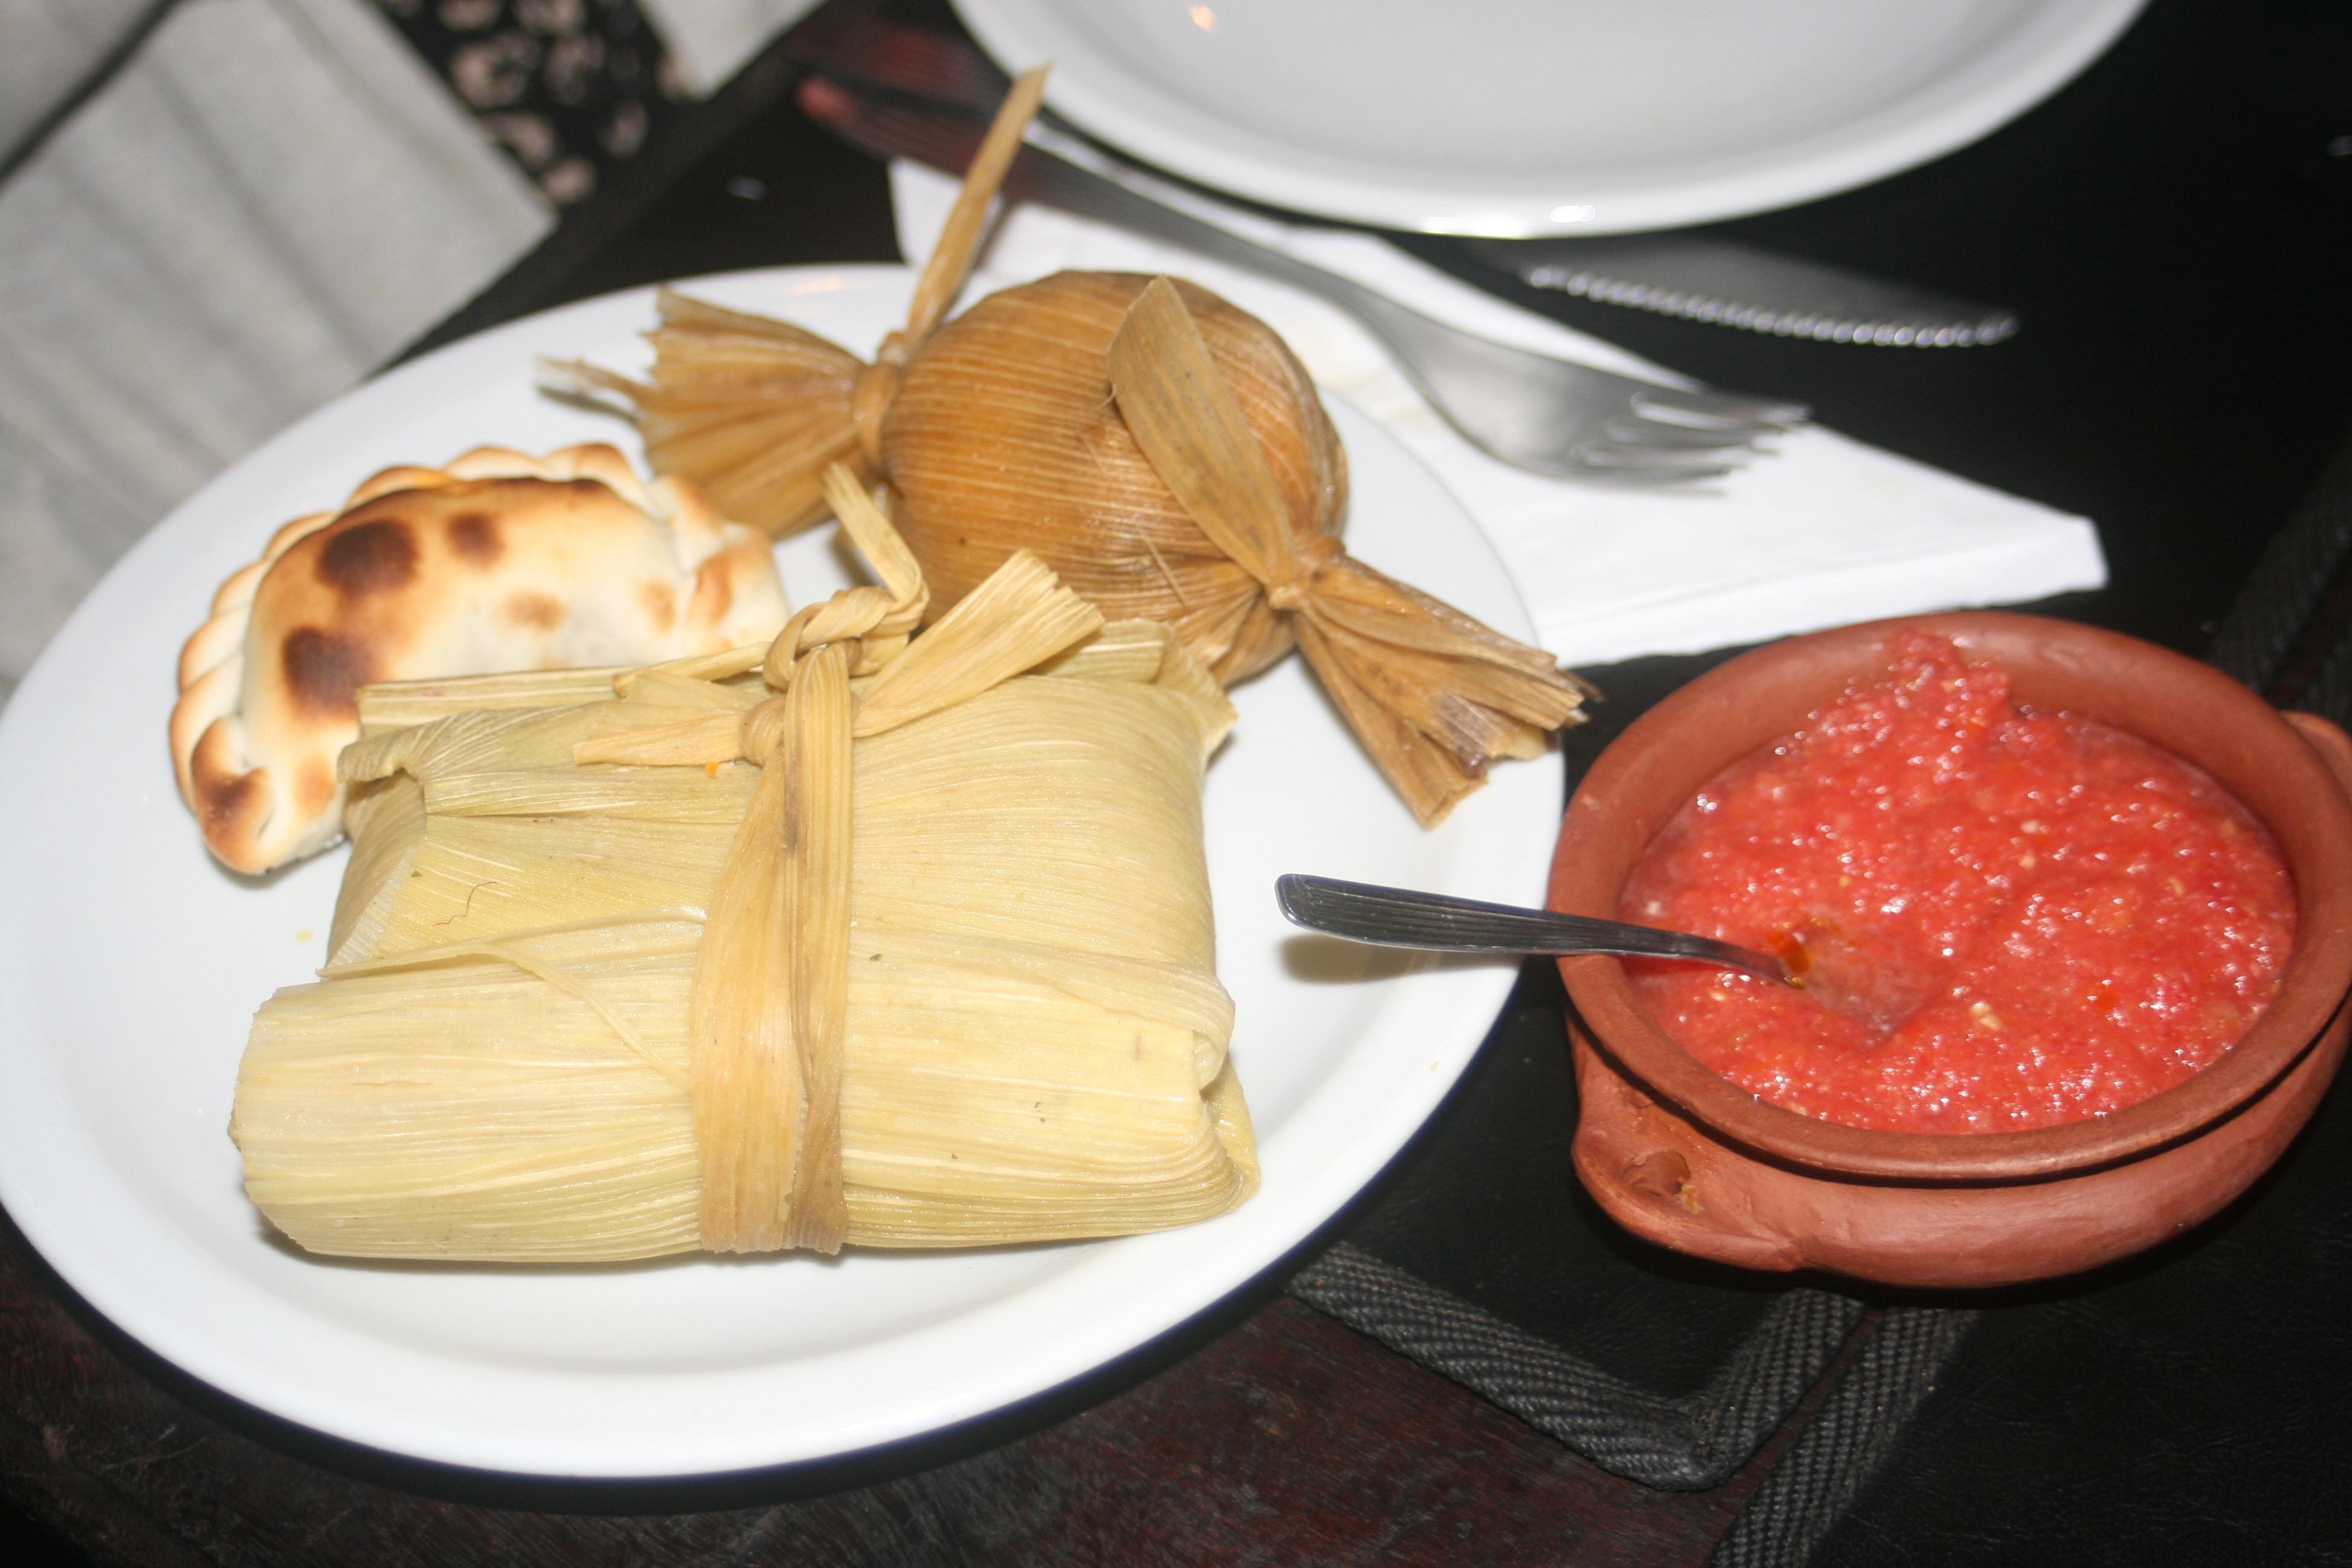 tamal, humita y empanada, Salta, Argentina